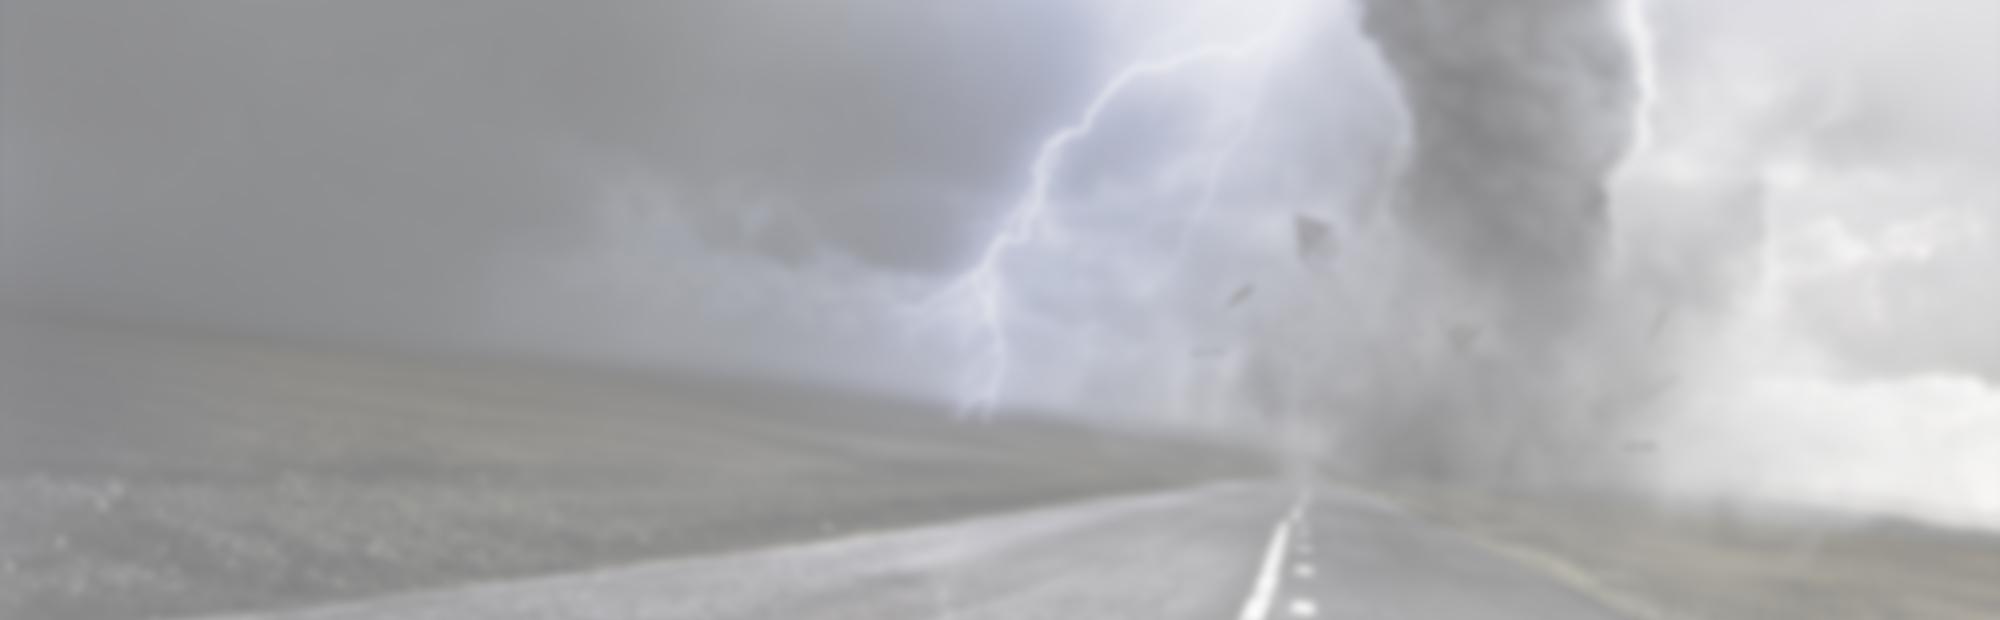 LMD_HP-Banner-Disaster_Background_Blank-e1424803115955